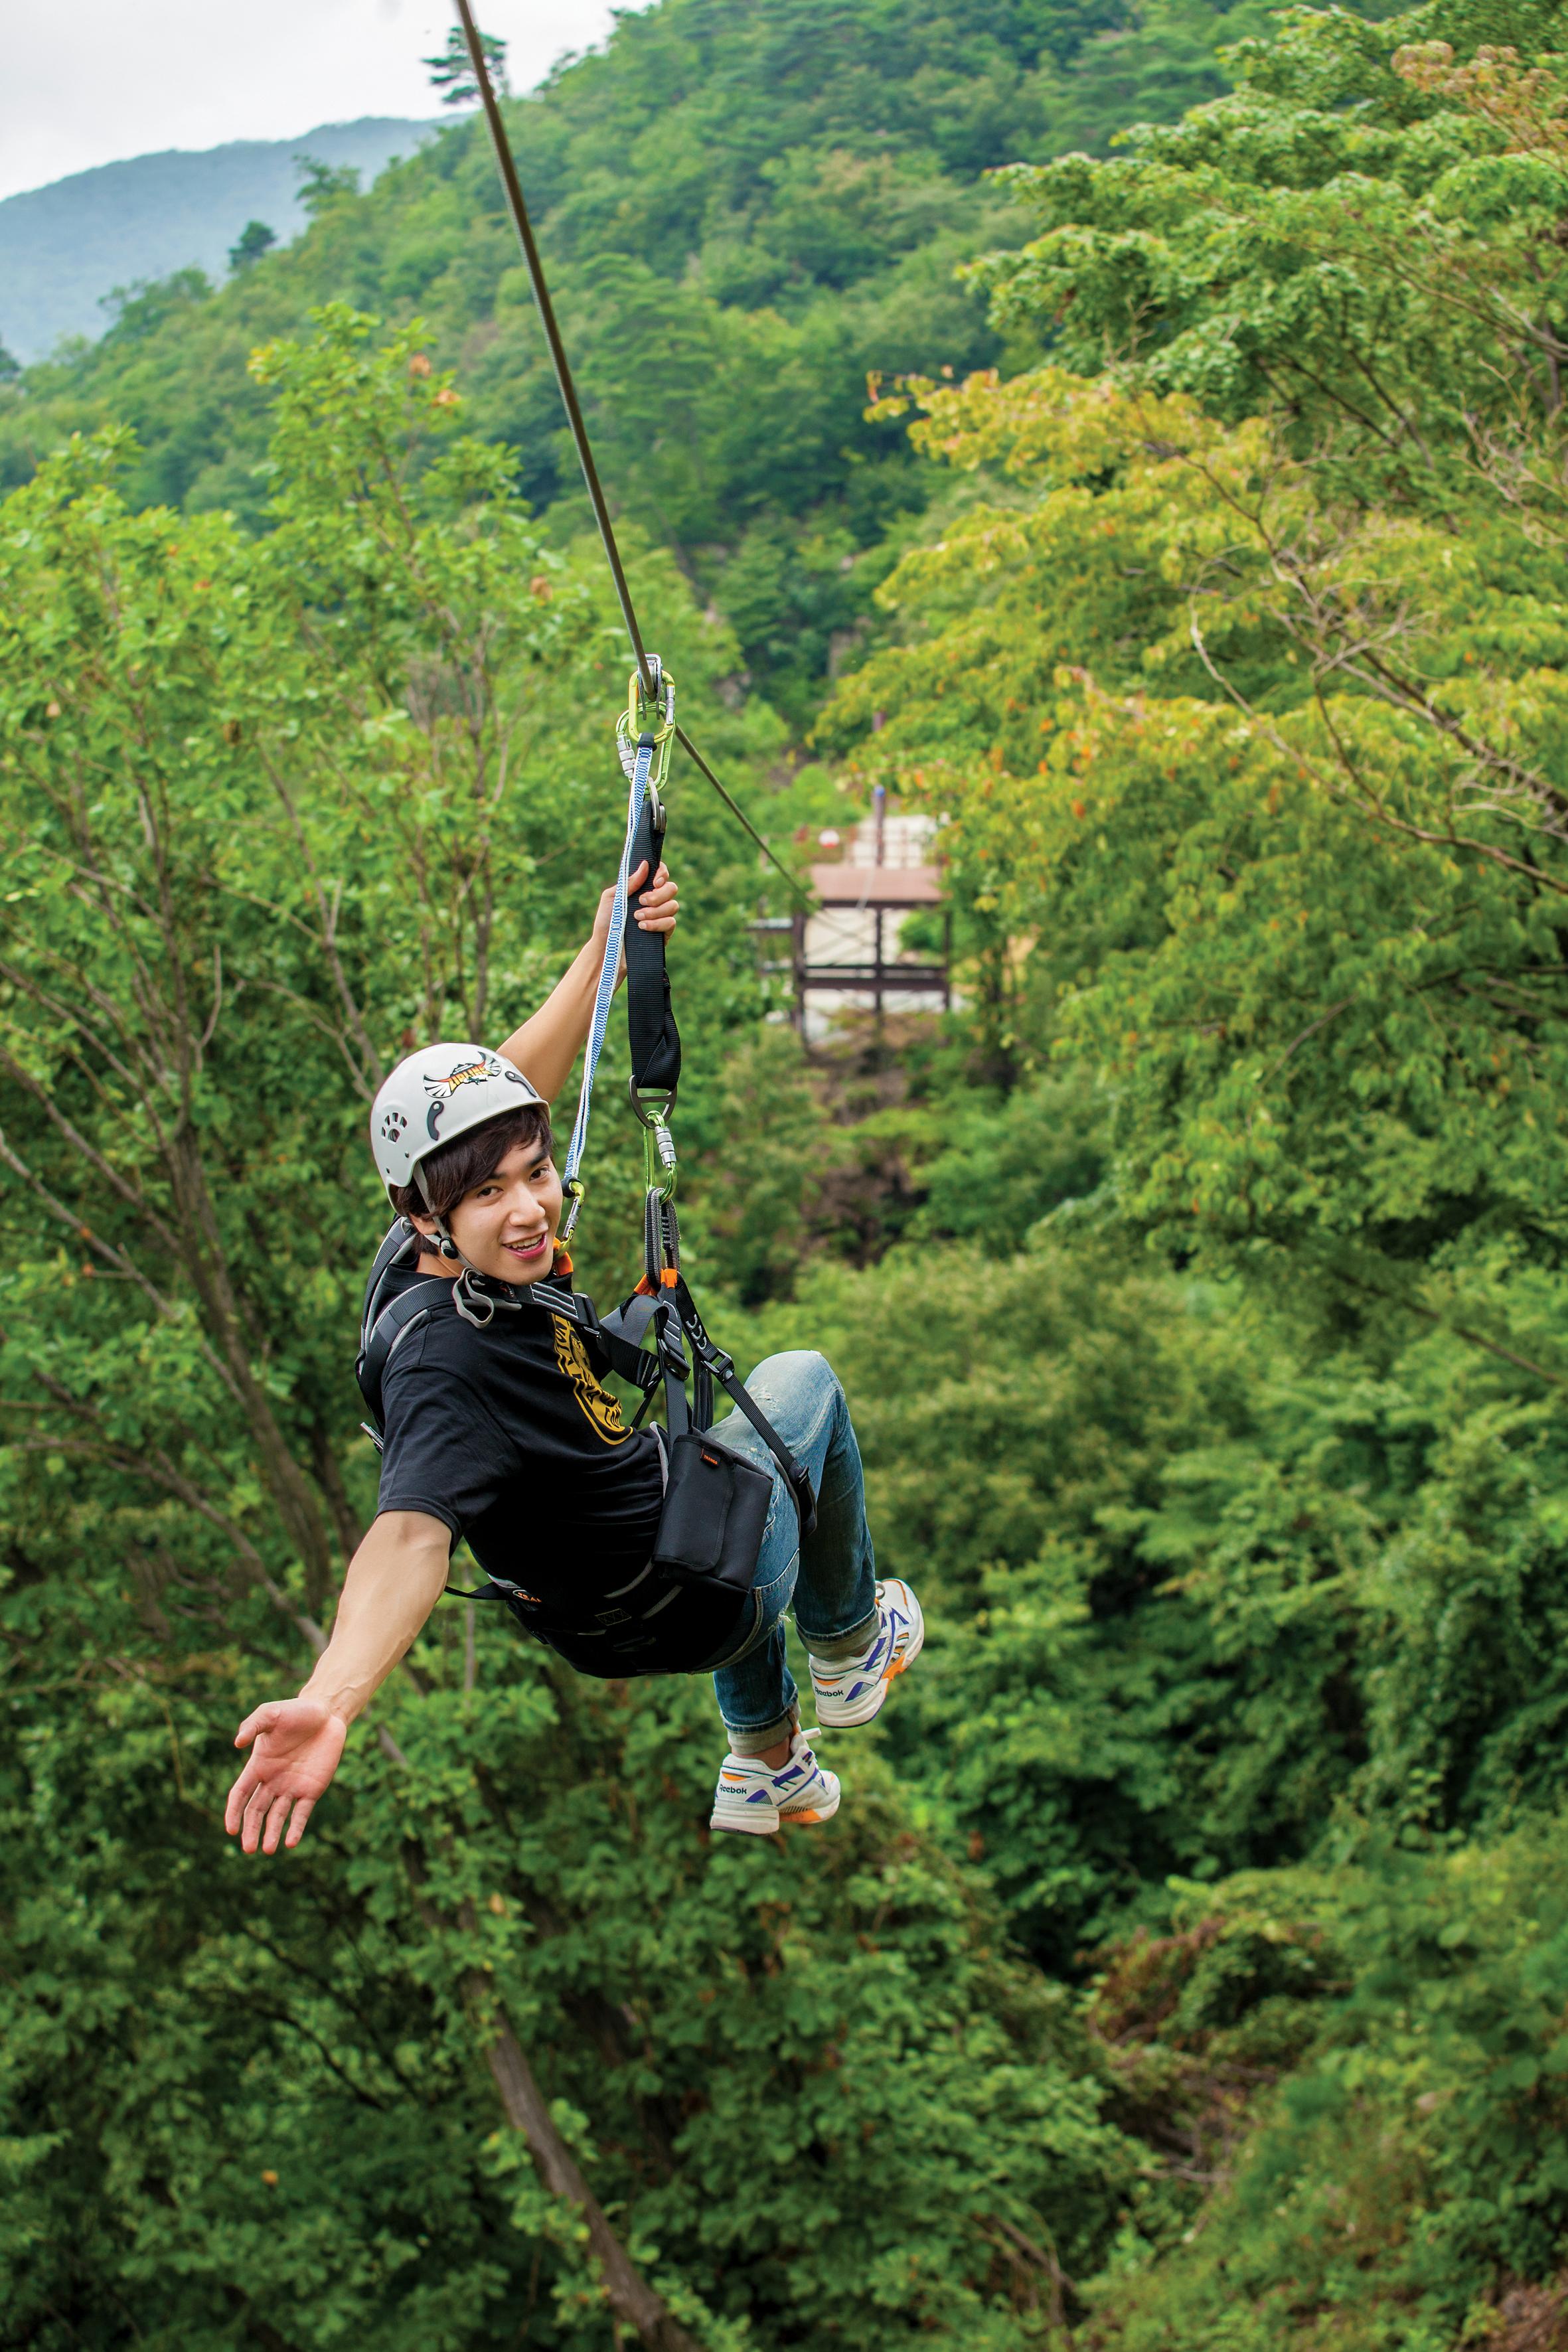 Zipline Yongin – Dynamic experience in Korea (Price, Tour, Hours…)